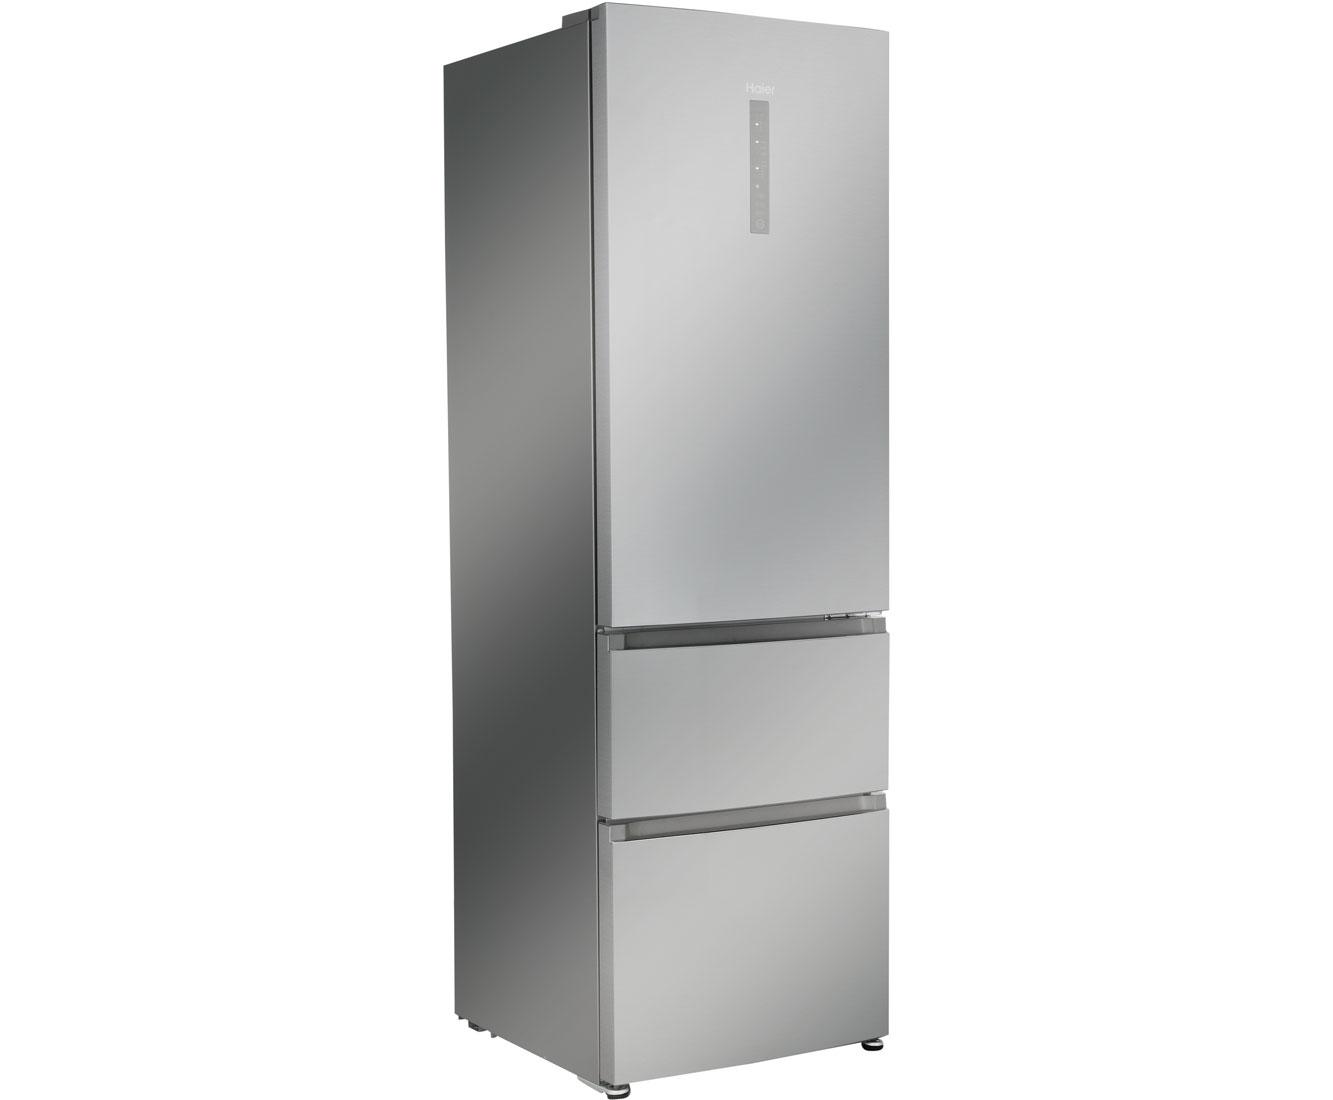 Bosch Kühlschrank Kühlt Nicht Mehr Richtig : Haier a3fe735cgje kühl gefrierkombination mit no frost silber a